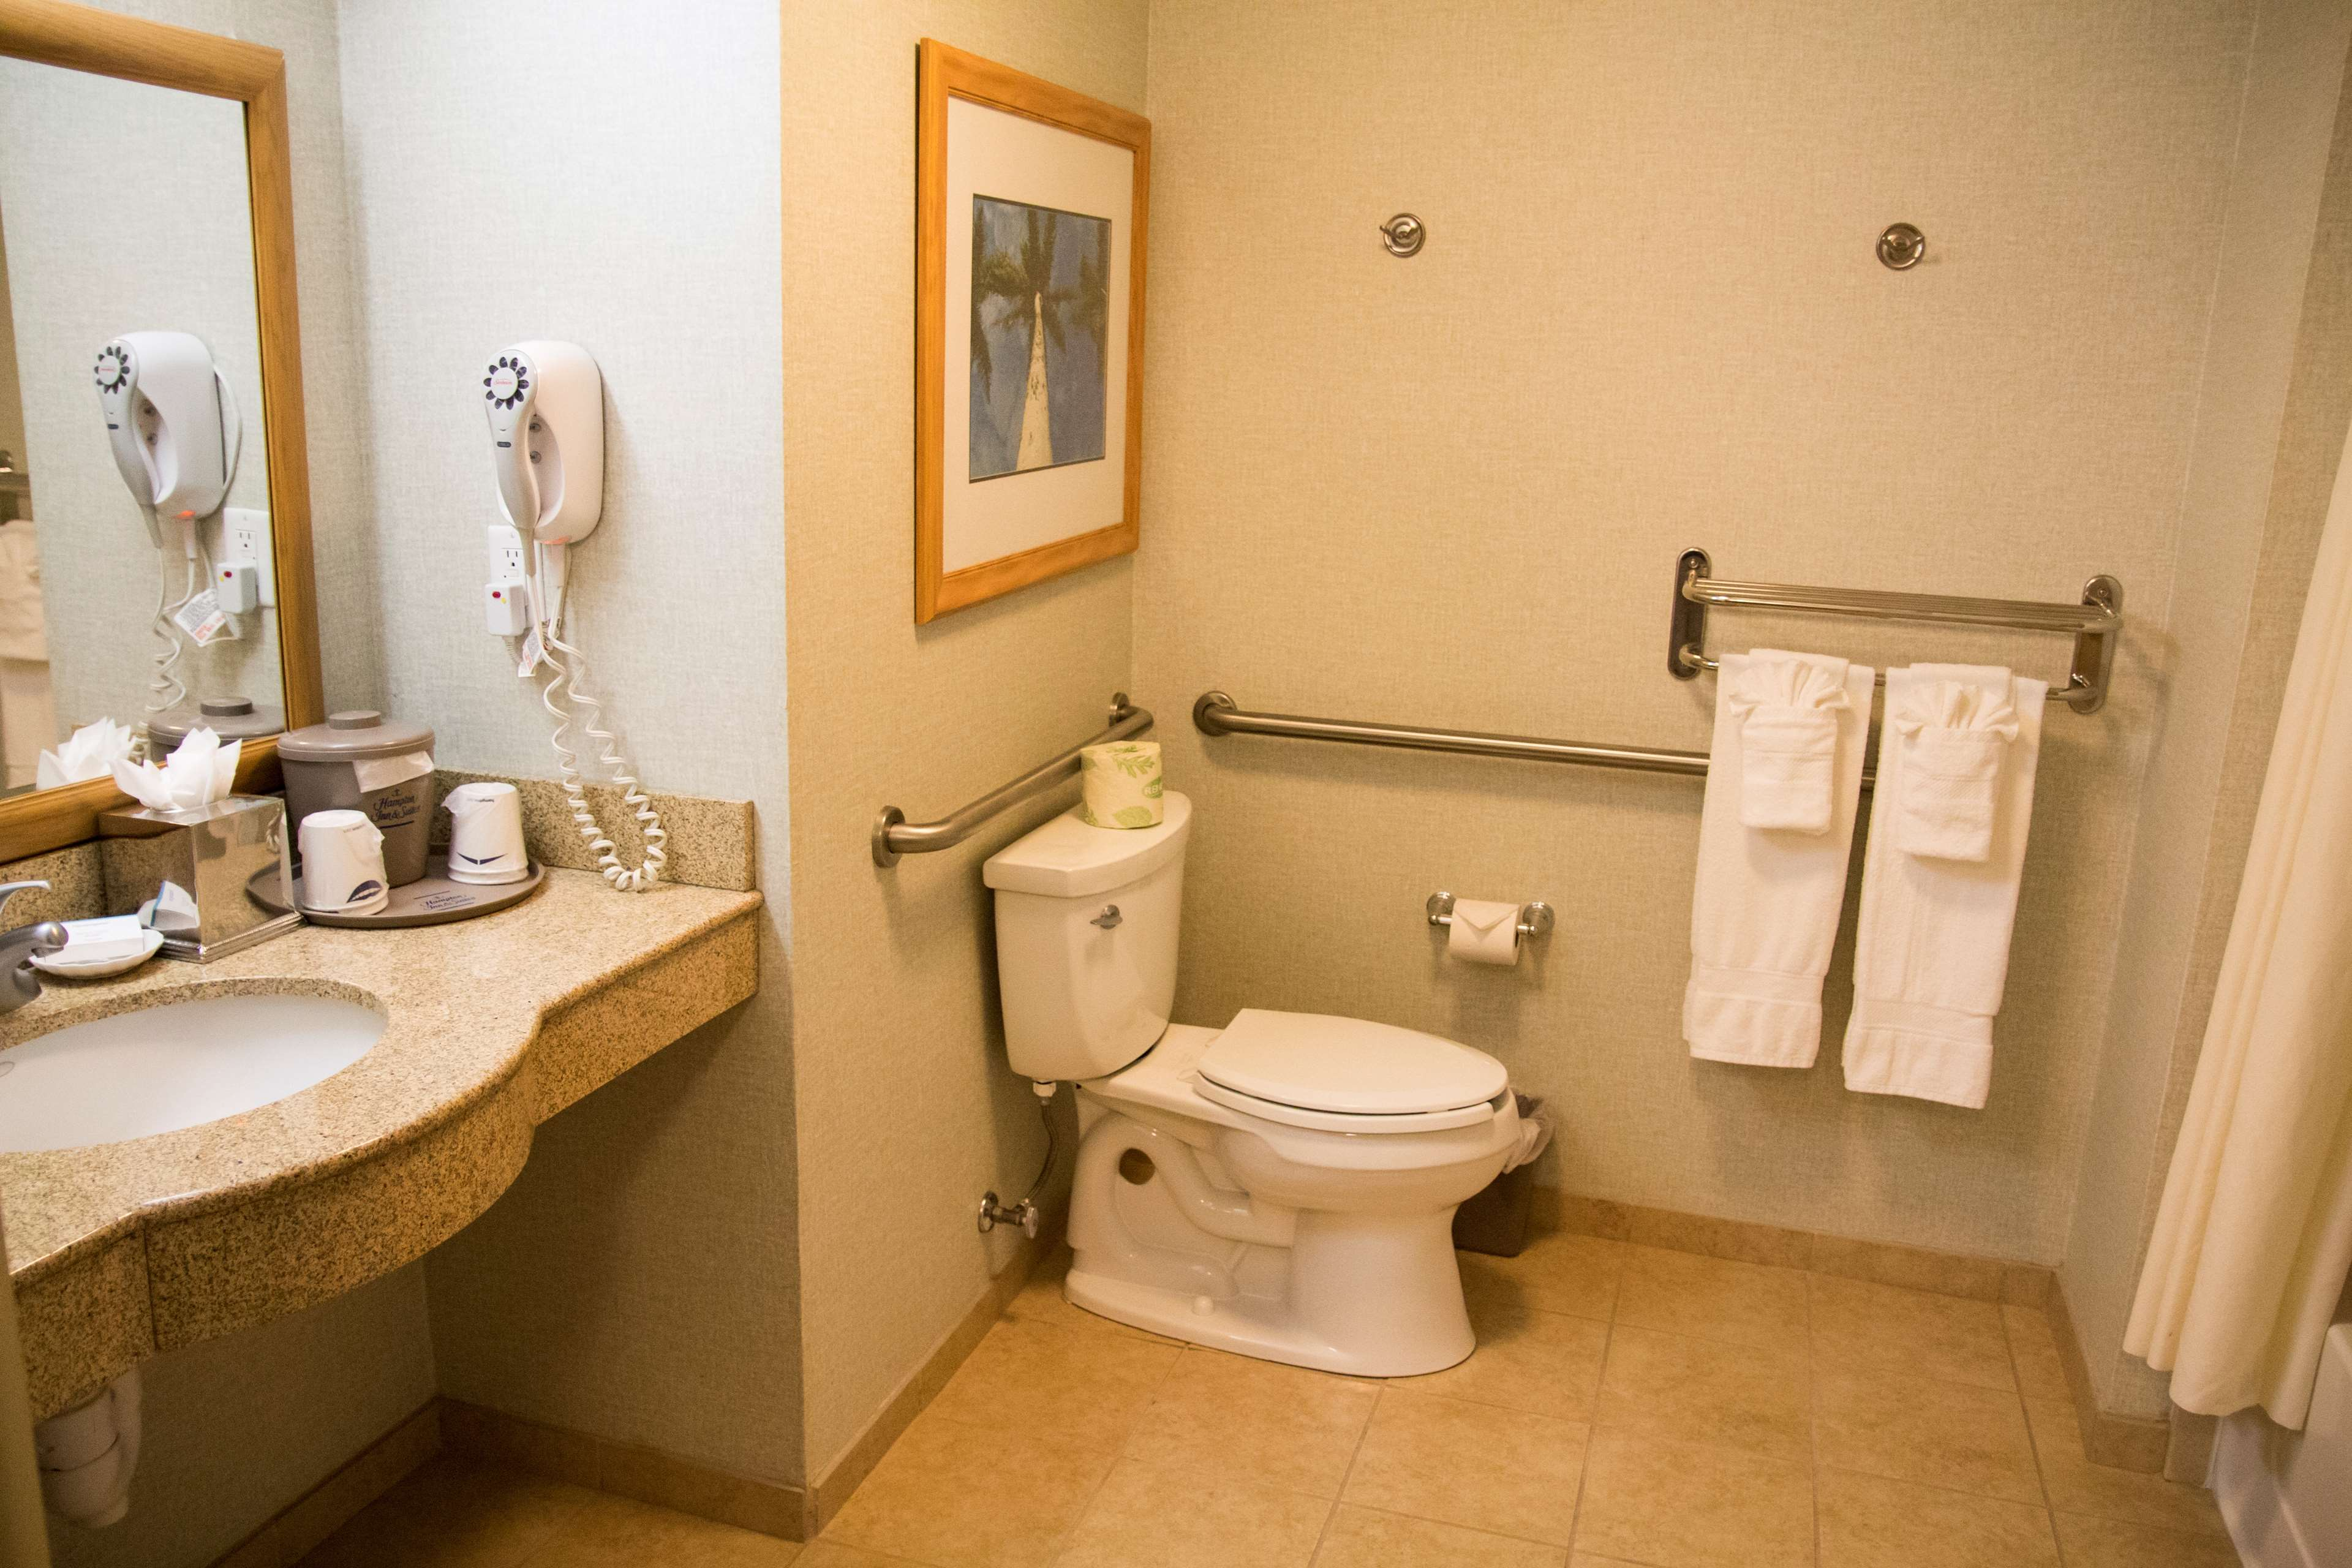 Hampton Inn & Suites Madera image 19